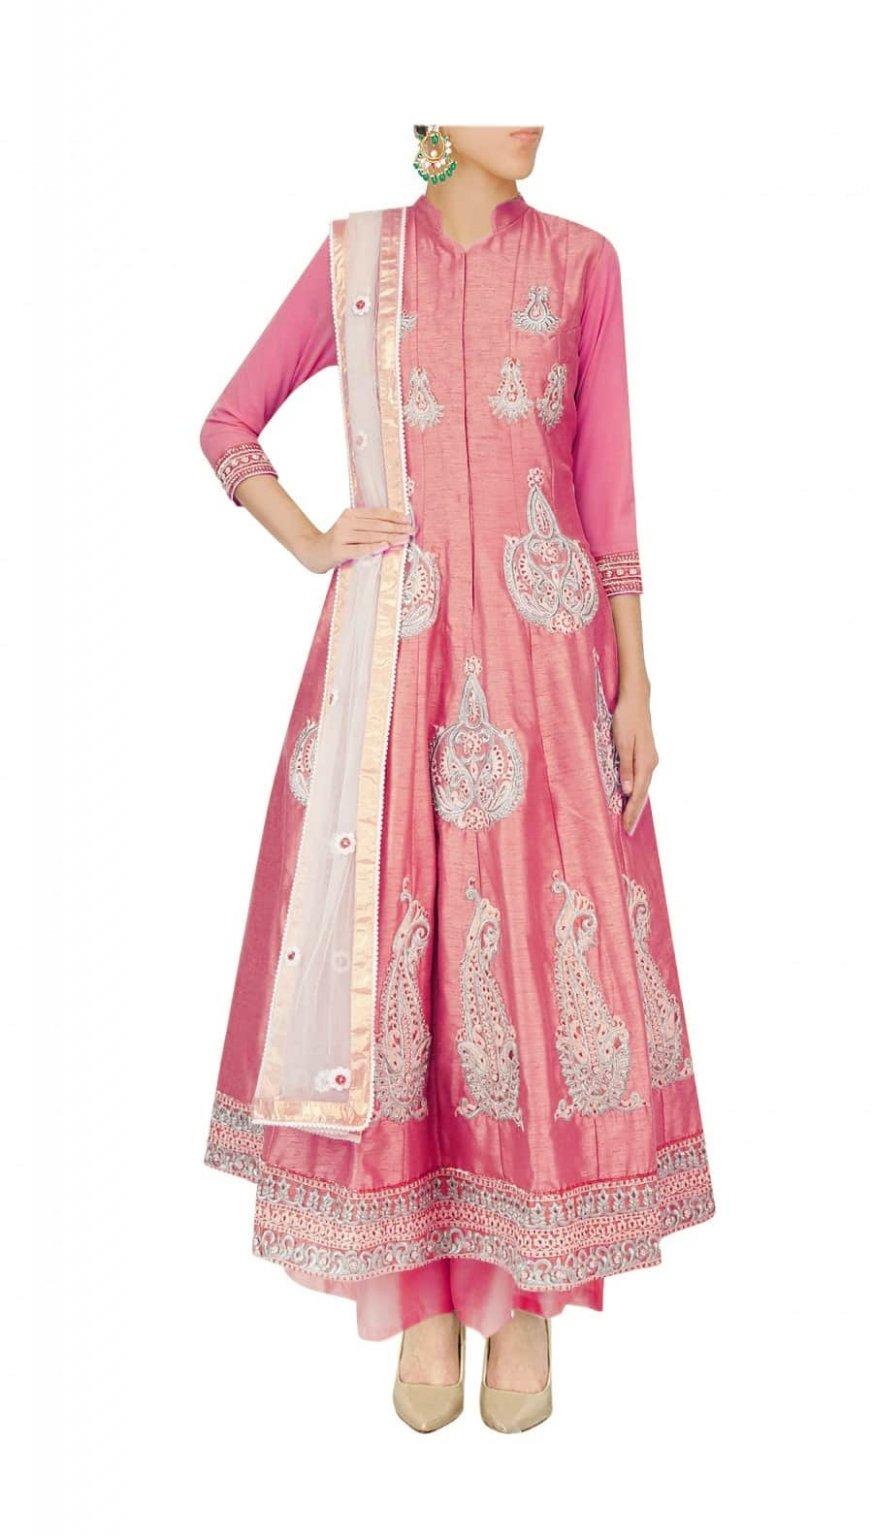 Rani Pink Embroidered Anarkali set